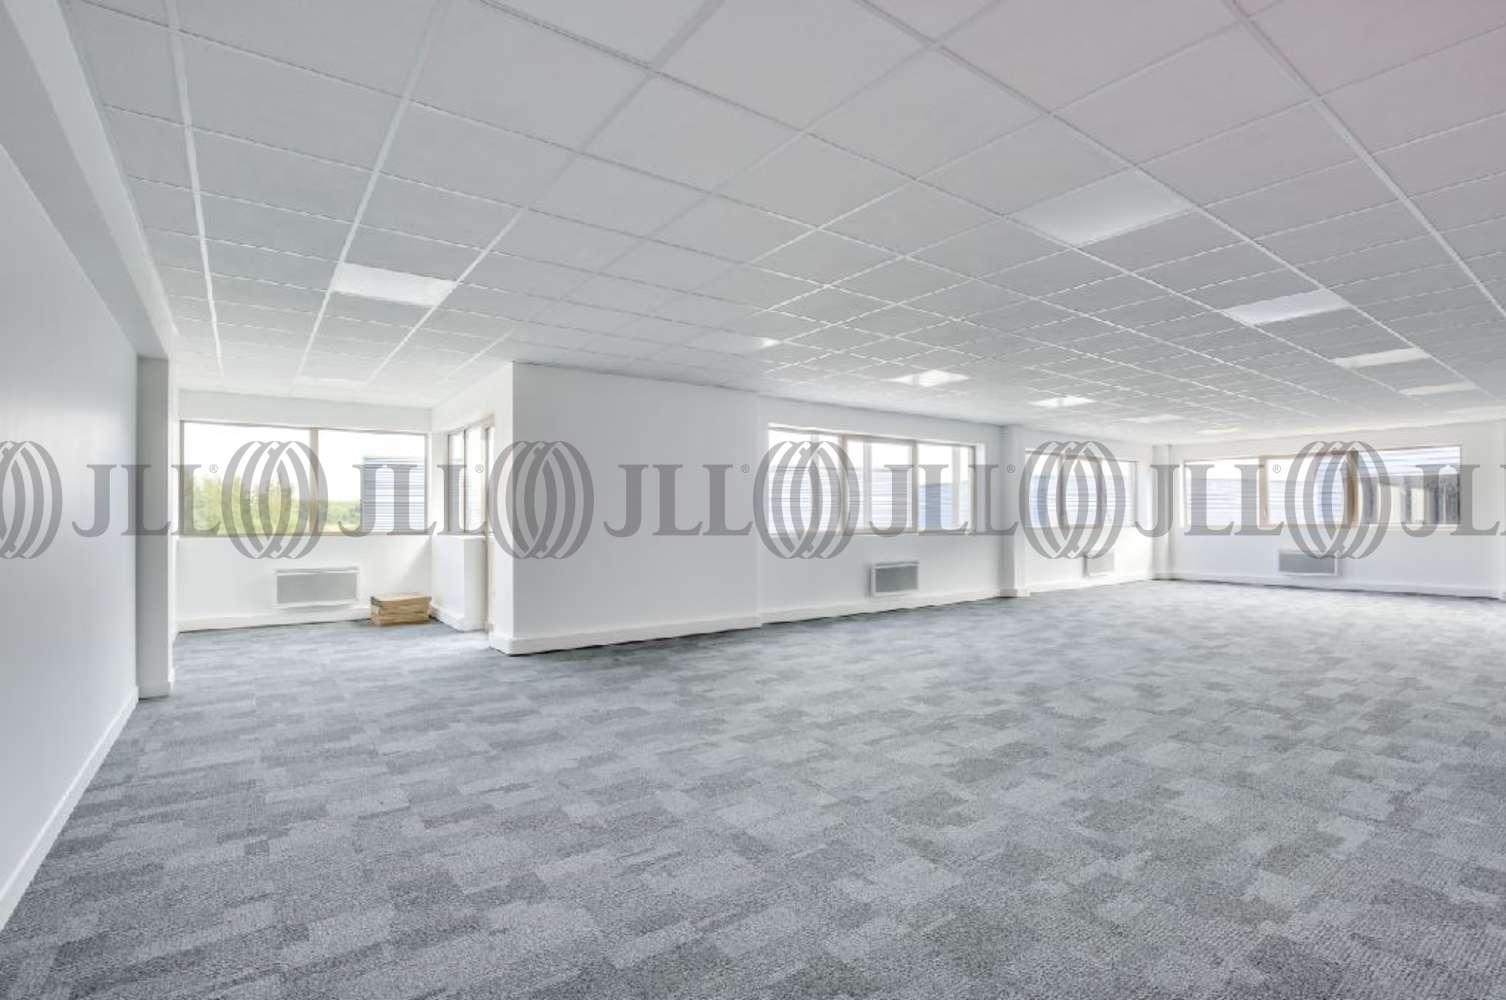 Activités/entrepôt Villebon sur yvette, 91140 - OGMA - 9621391